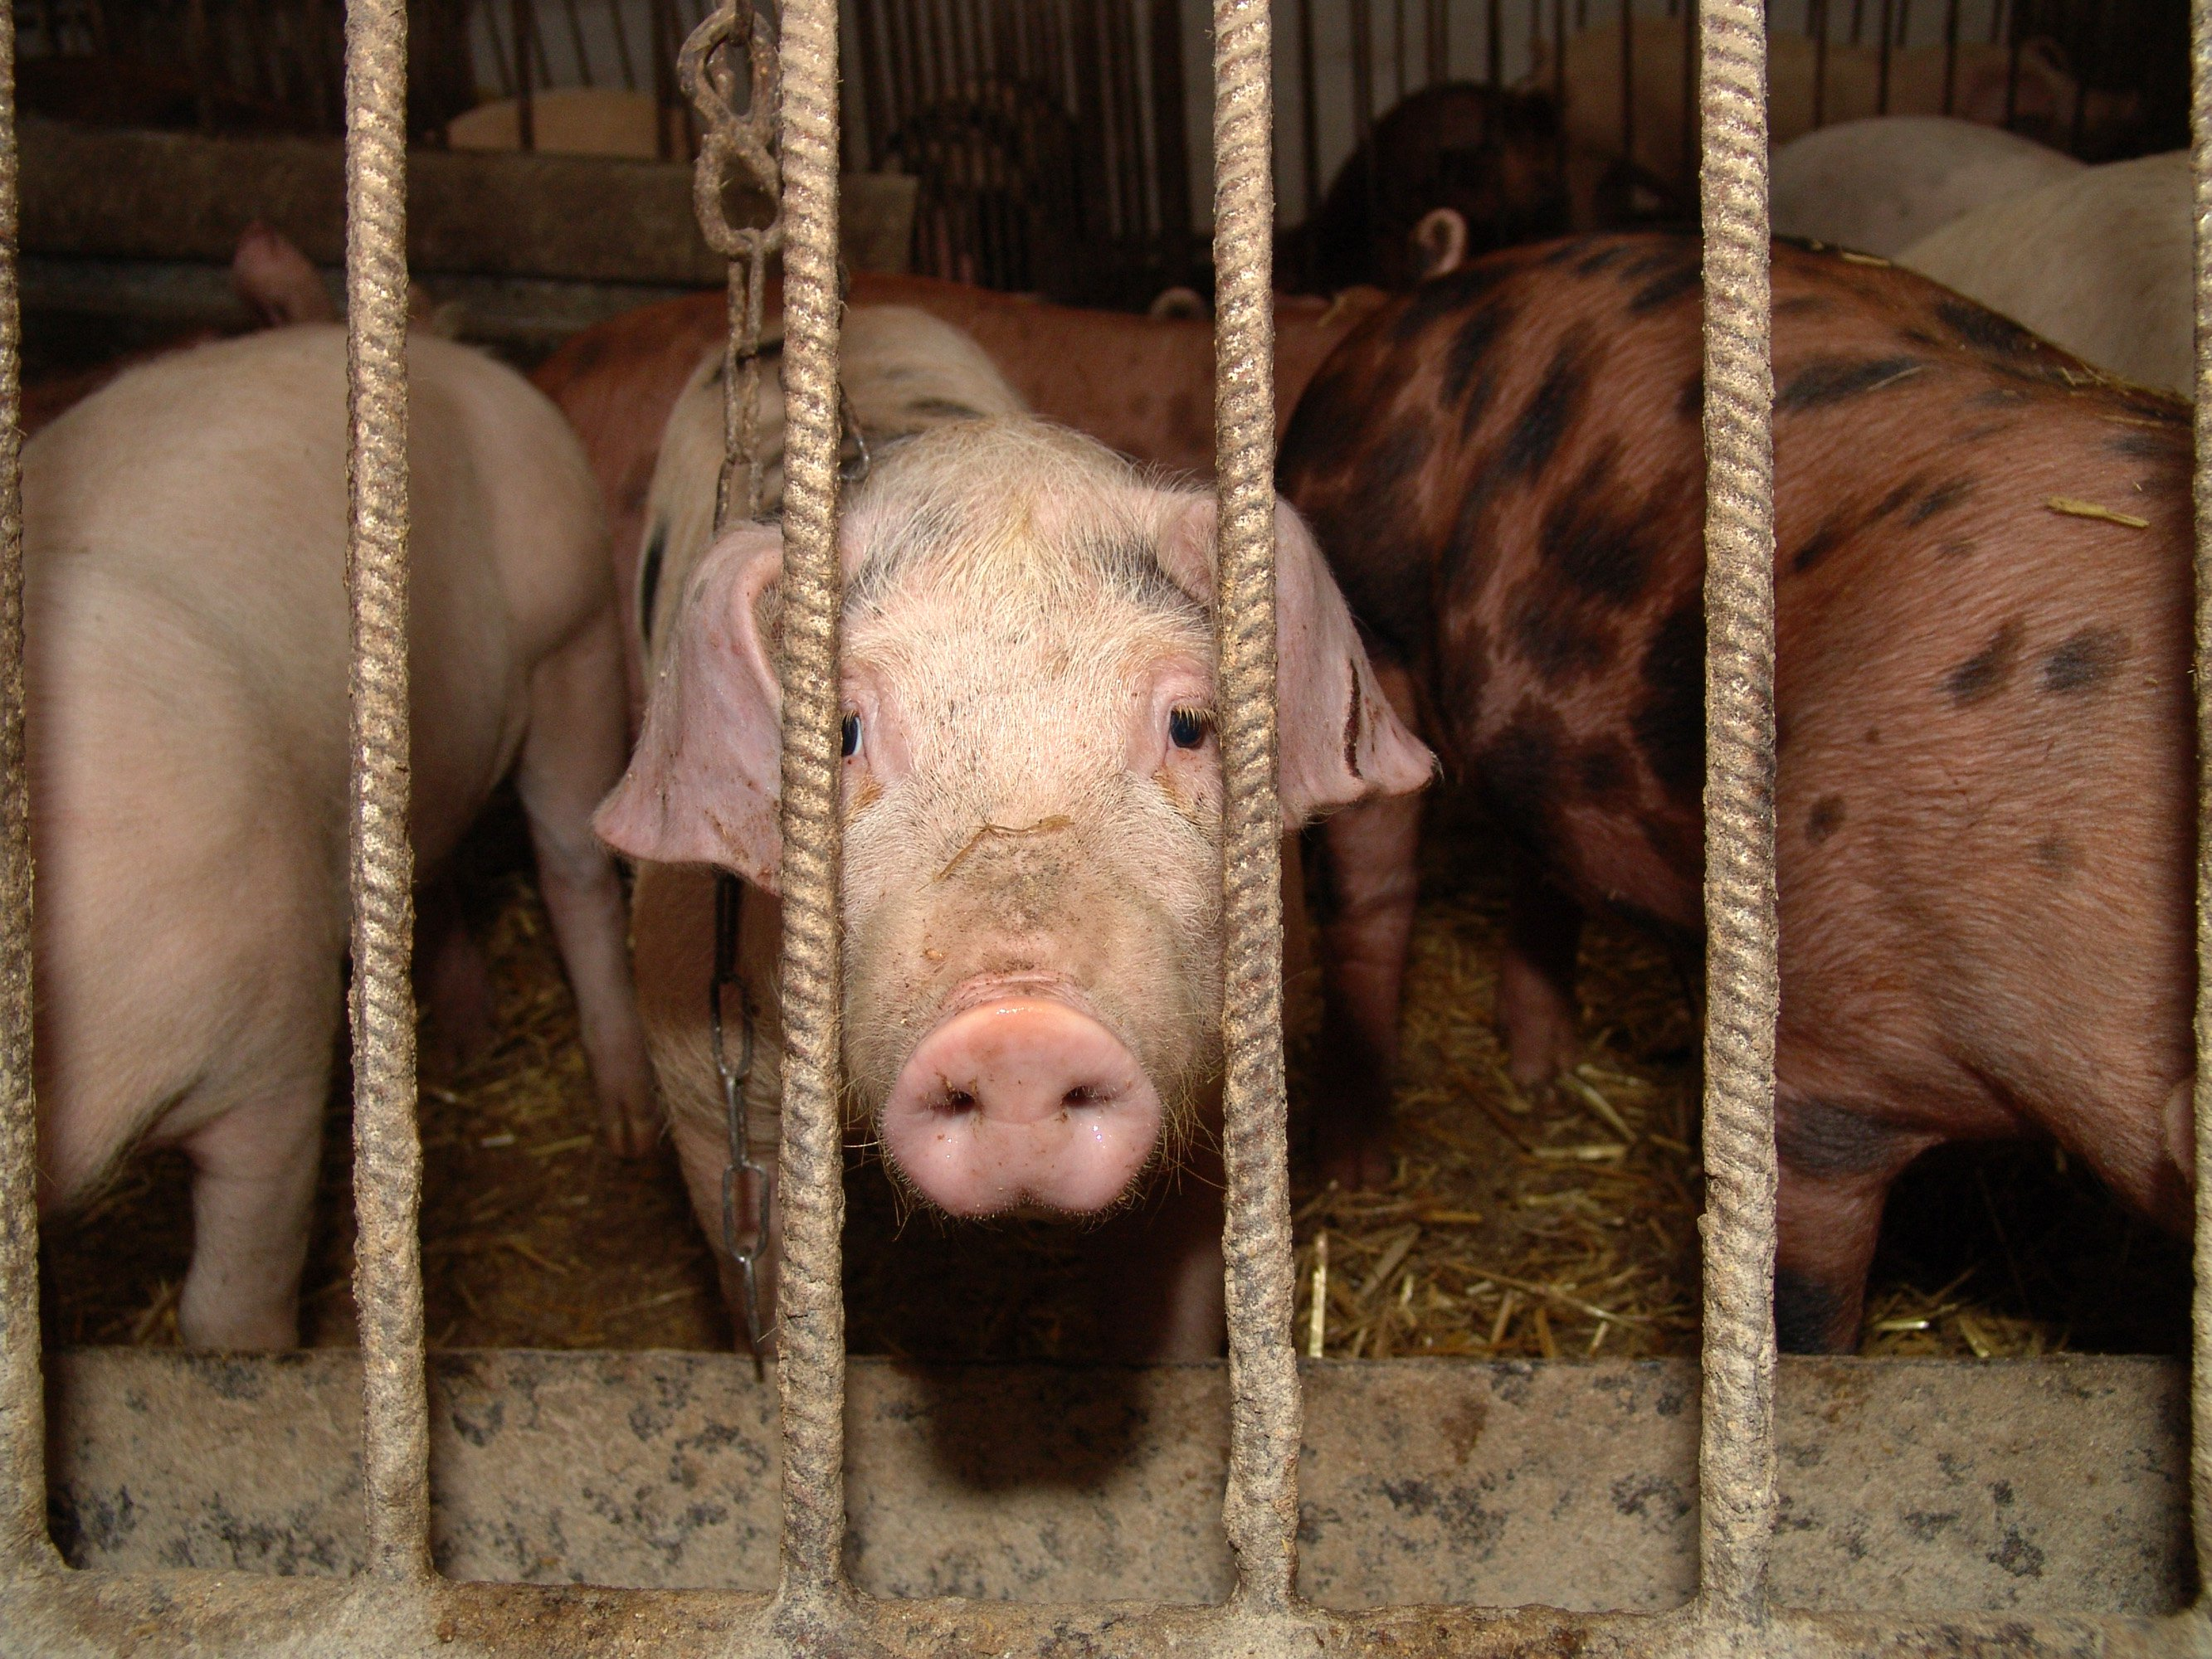 18 imágenes que te impedirán comer perros calientes otra vez | Blog | PETA Latino